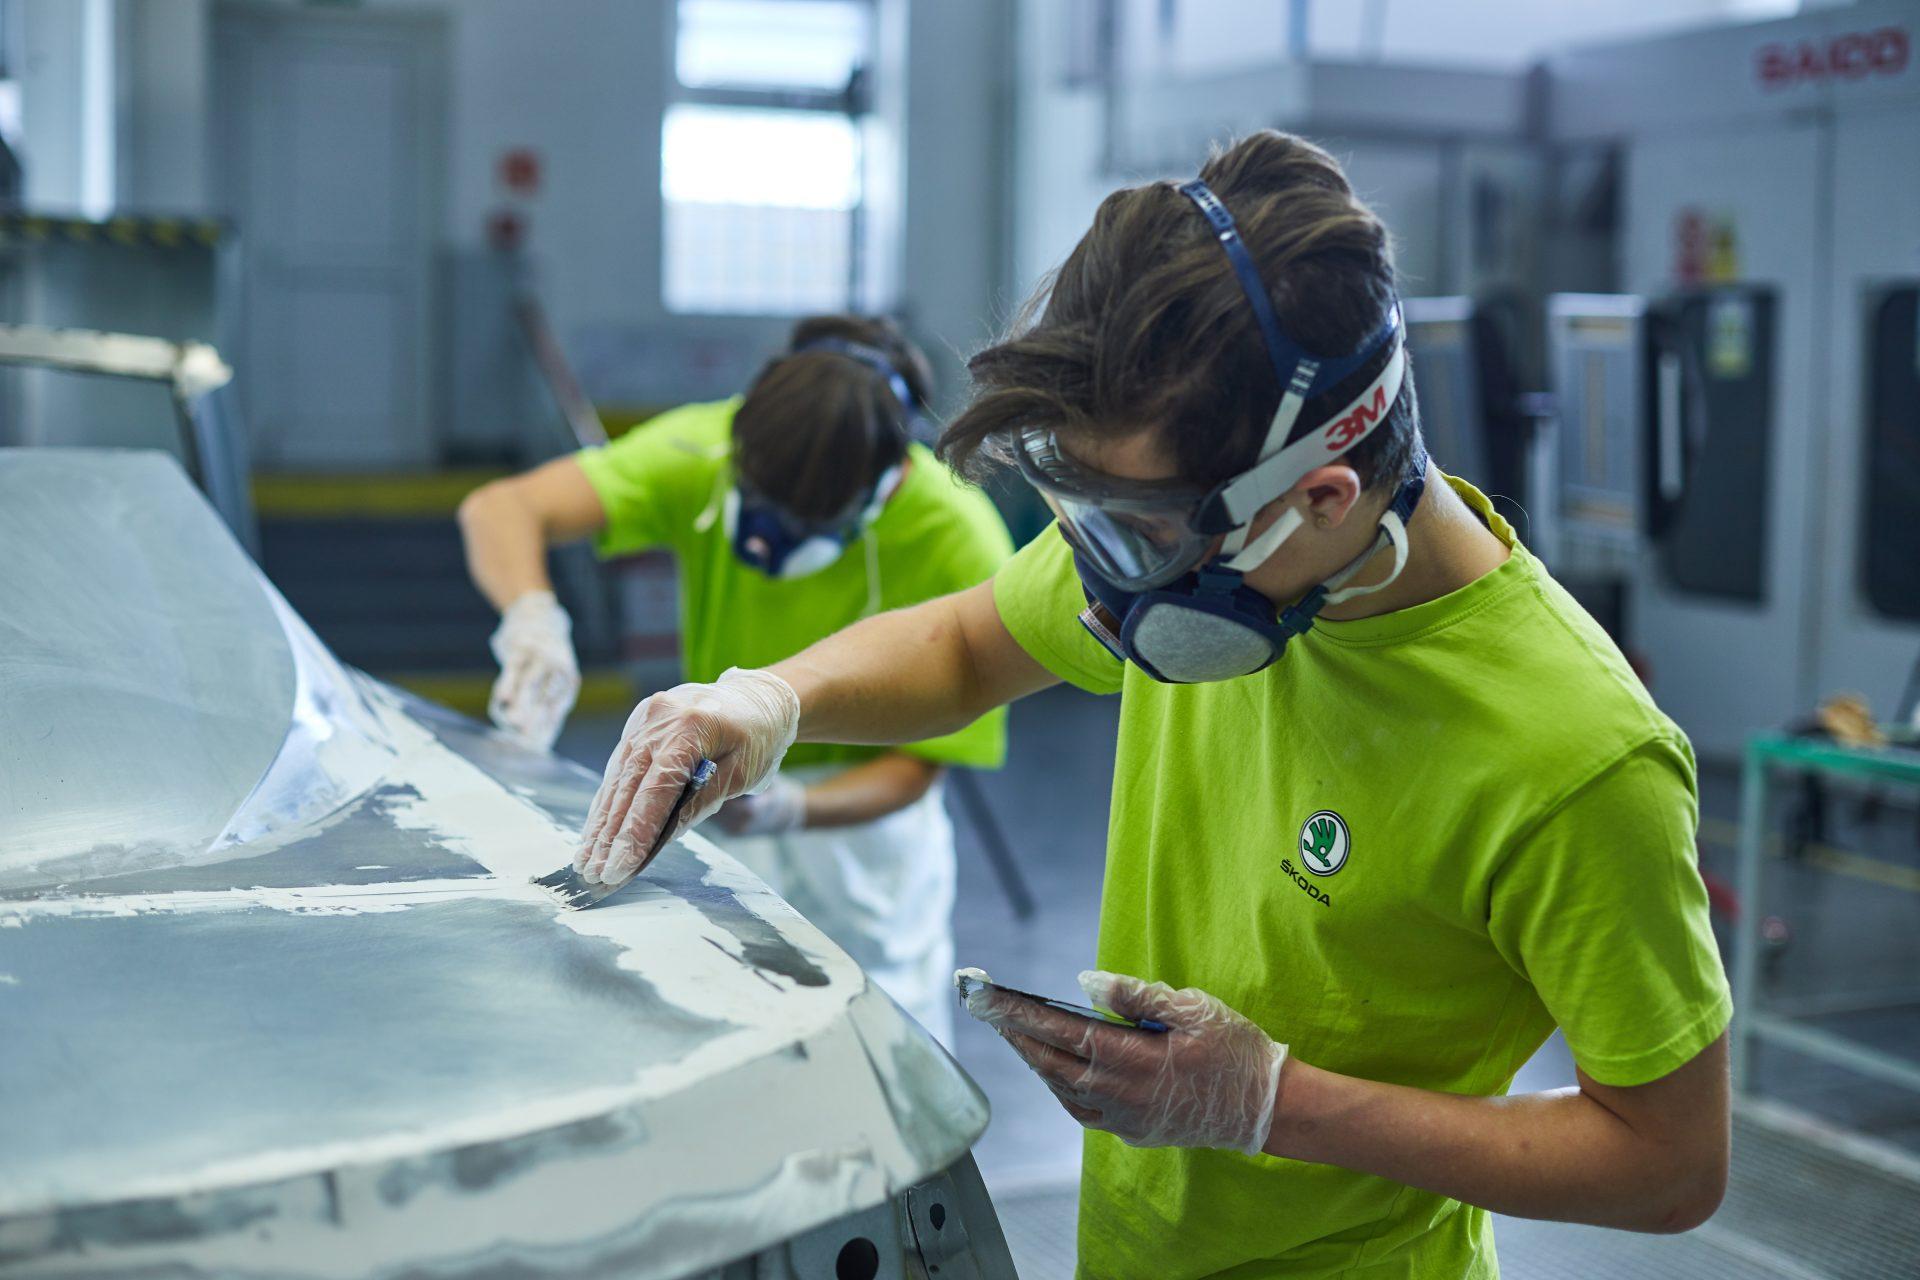 SKODA Academy concept car - Χτίζοντας το με το χέρι